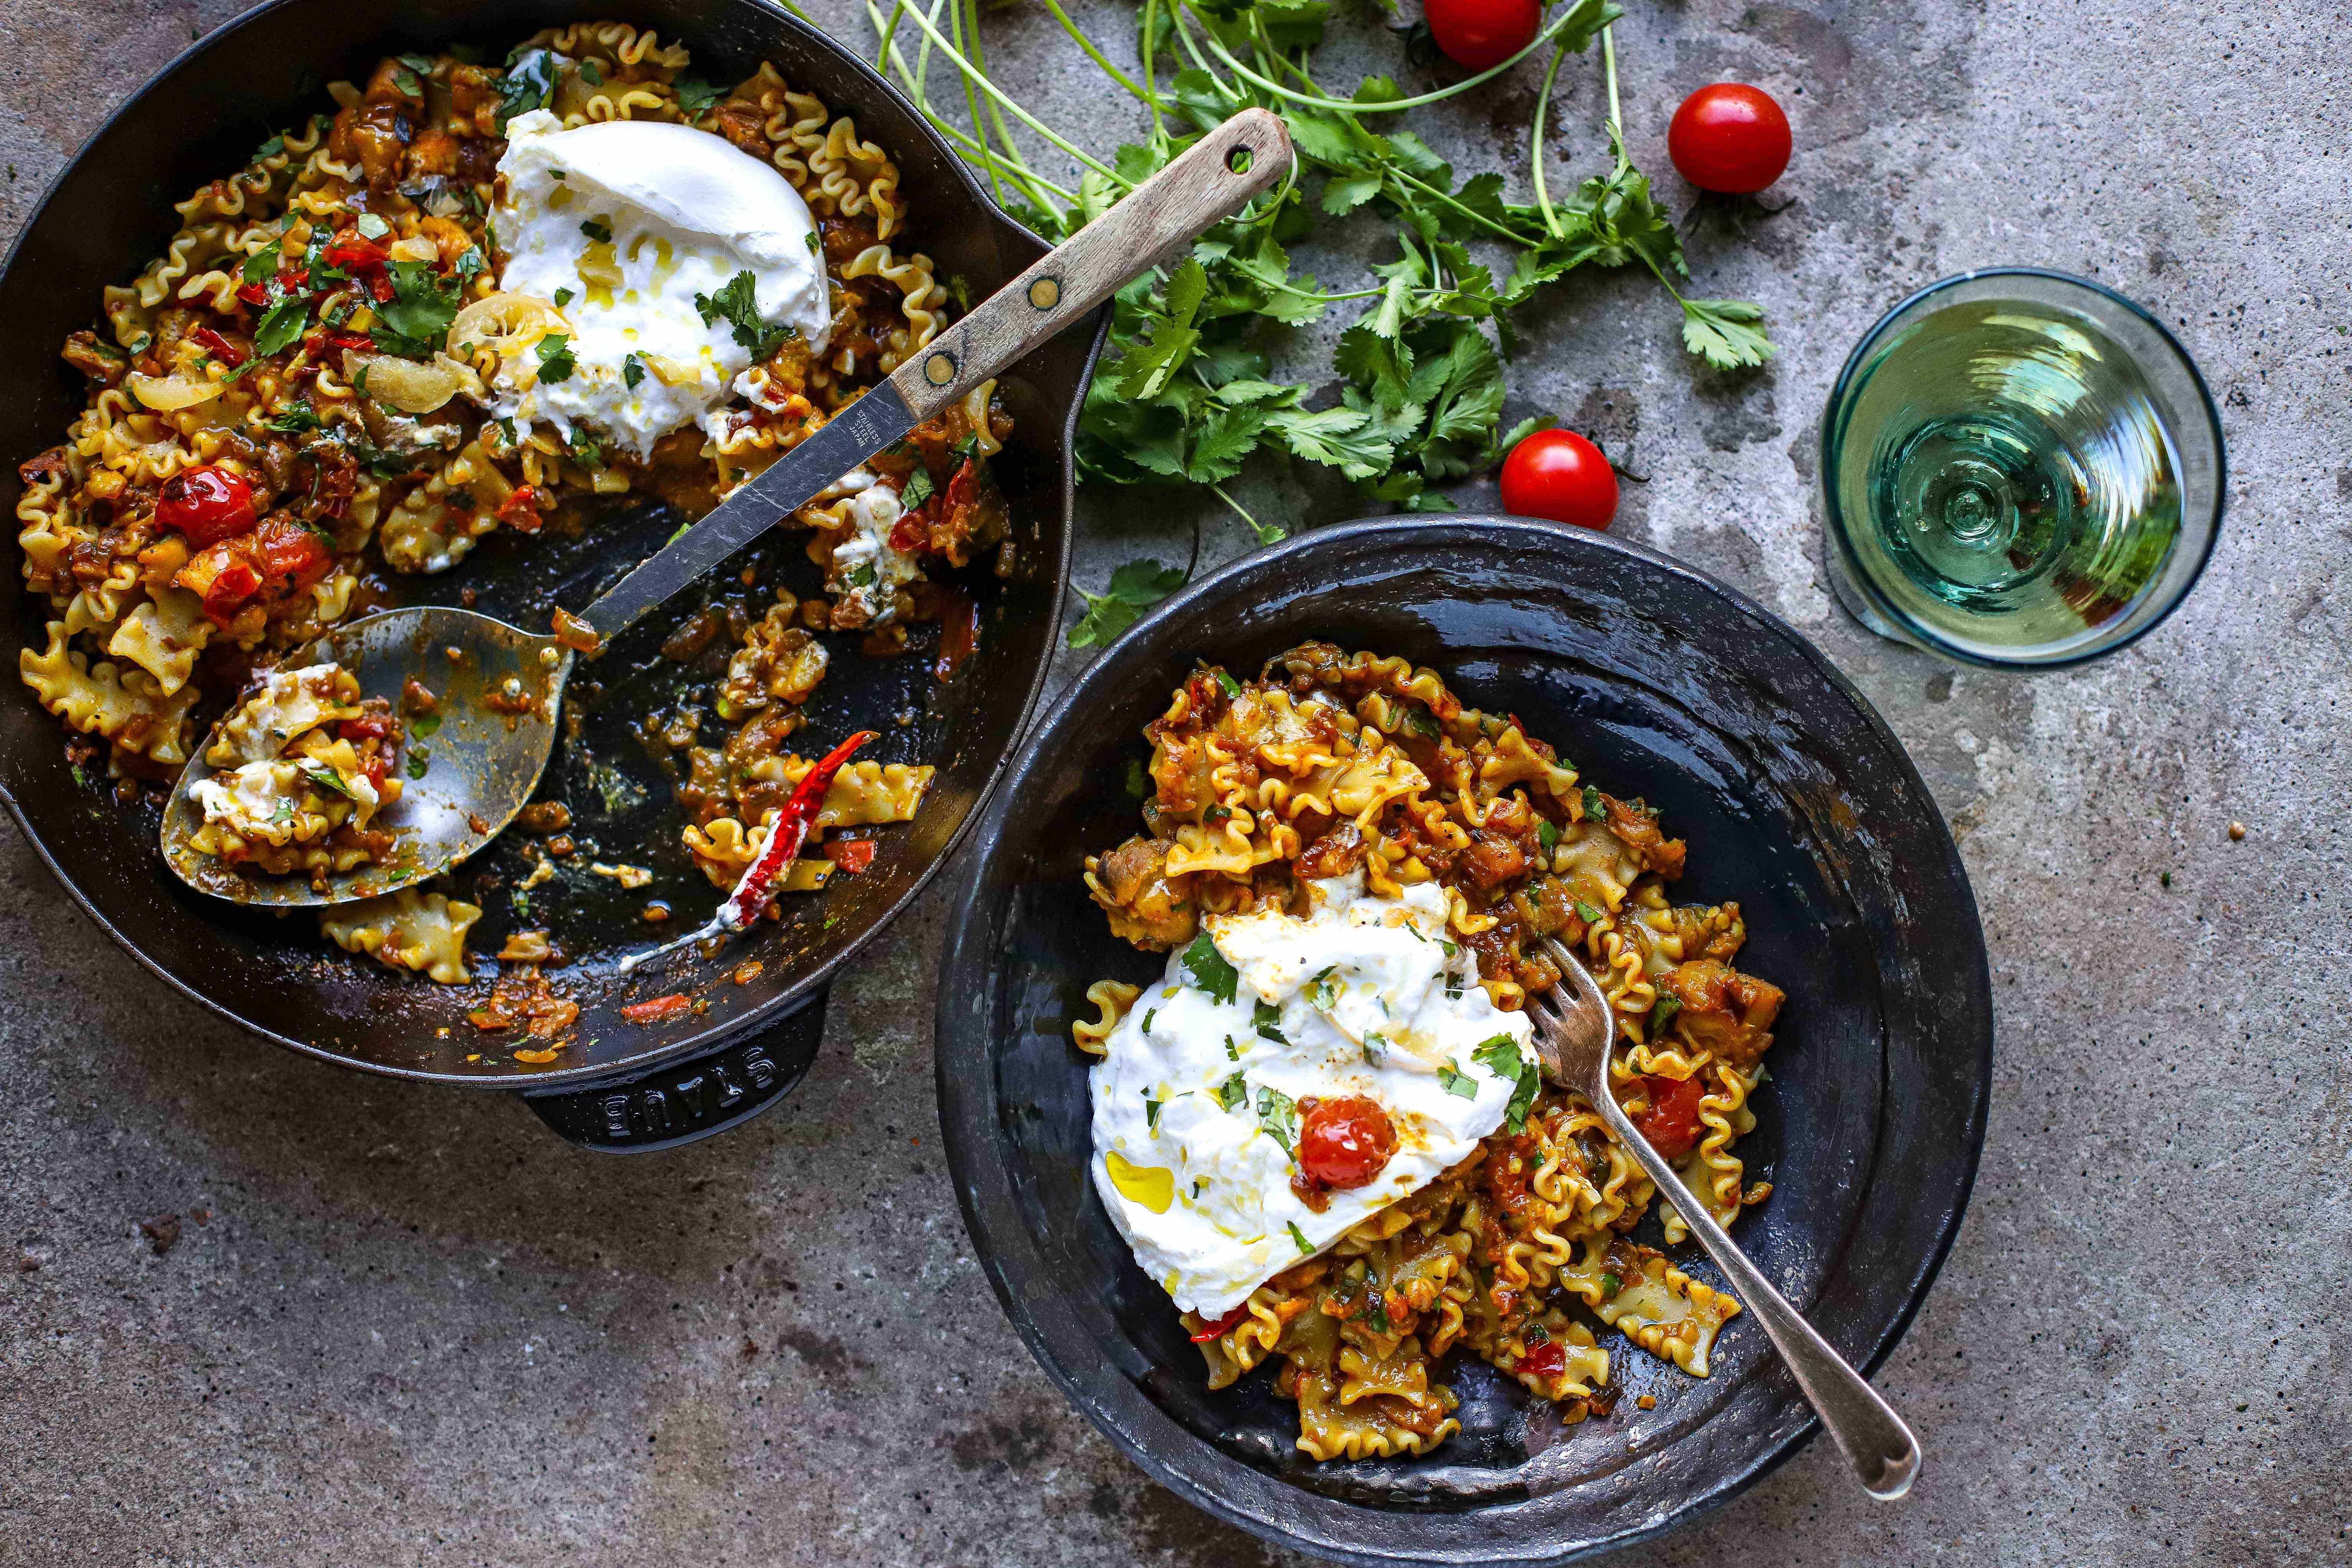 baingan bharta pasta with burrata in skillet and bowl